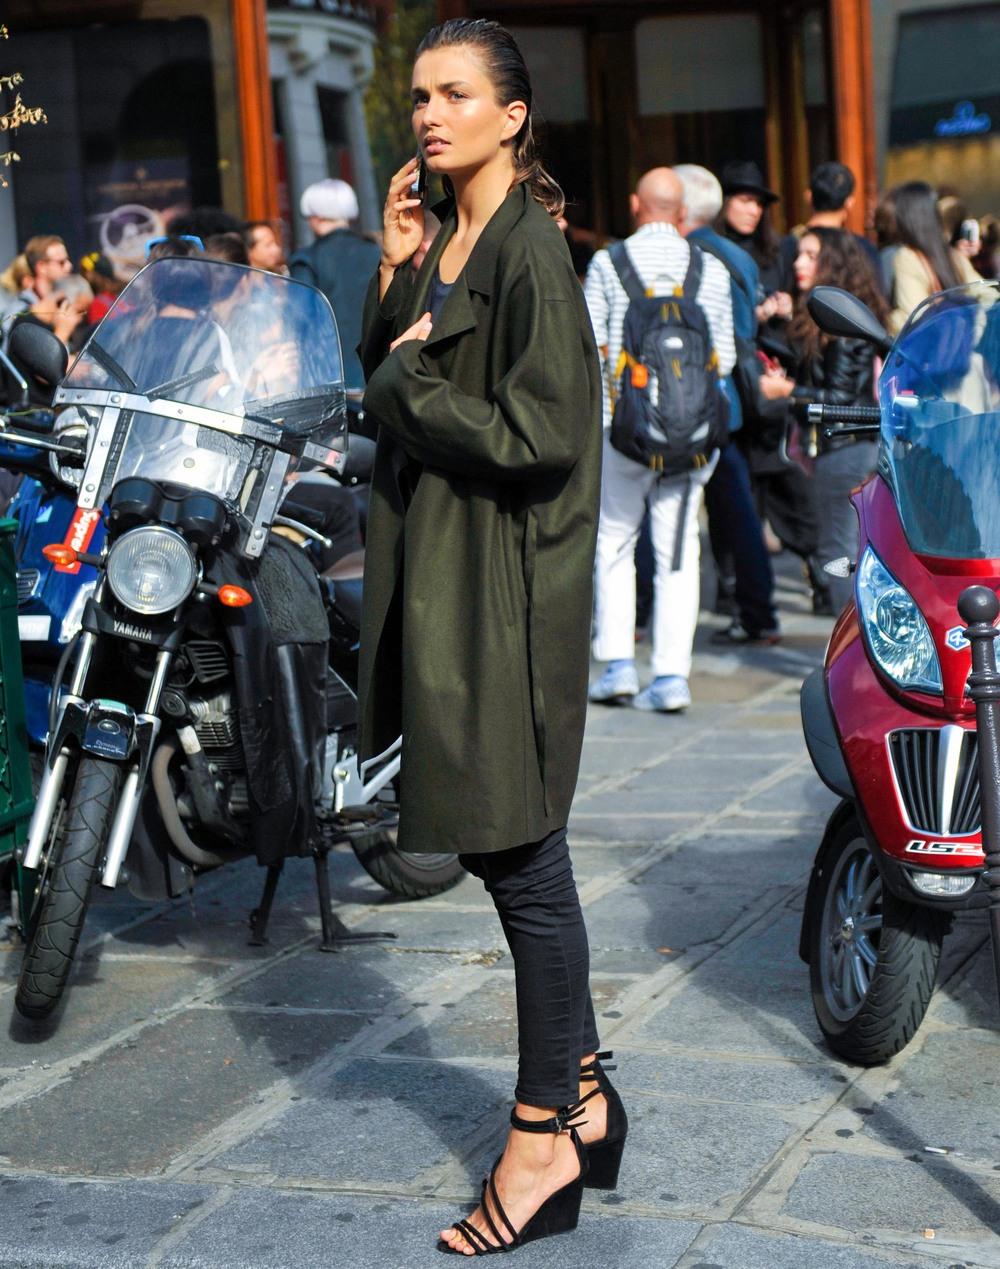 StreetStyle_ParisFashionWeek_LeandroJusten_069.jpg